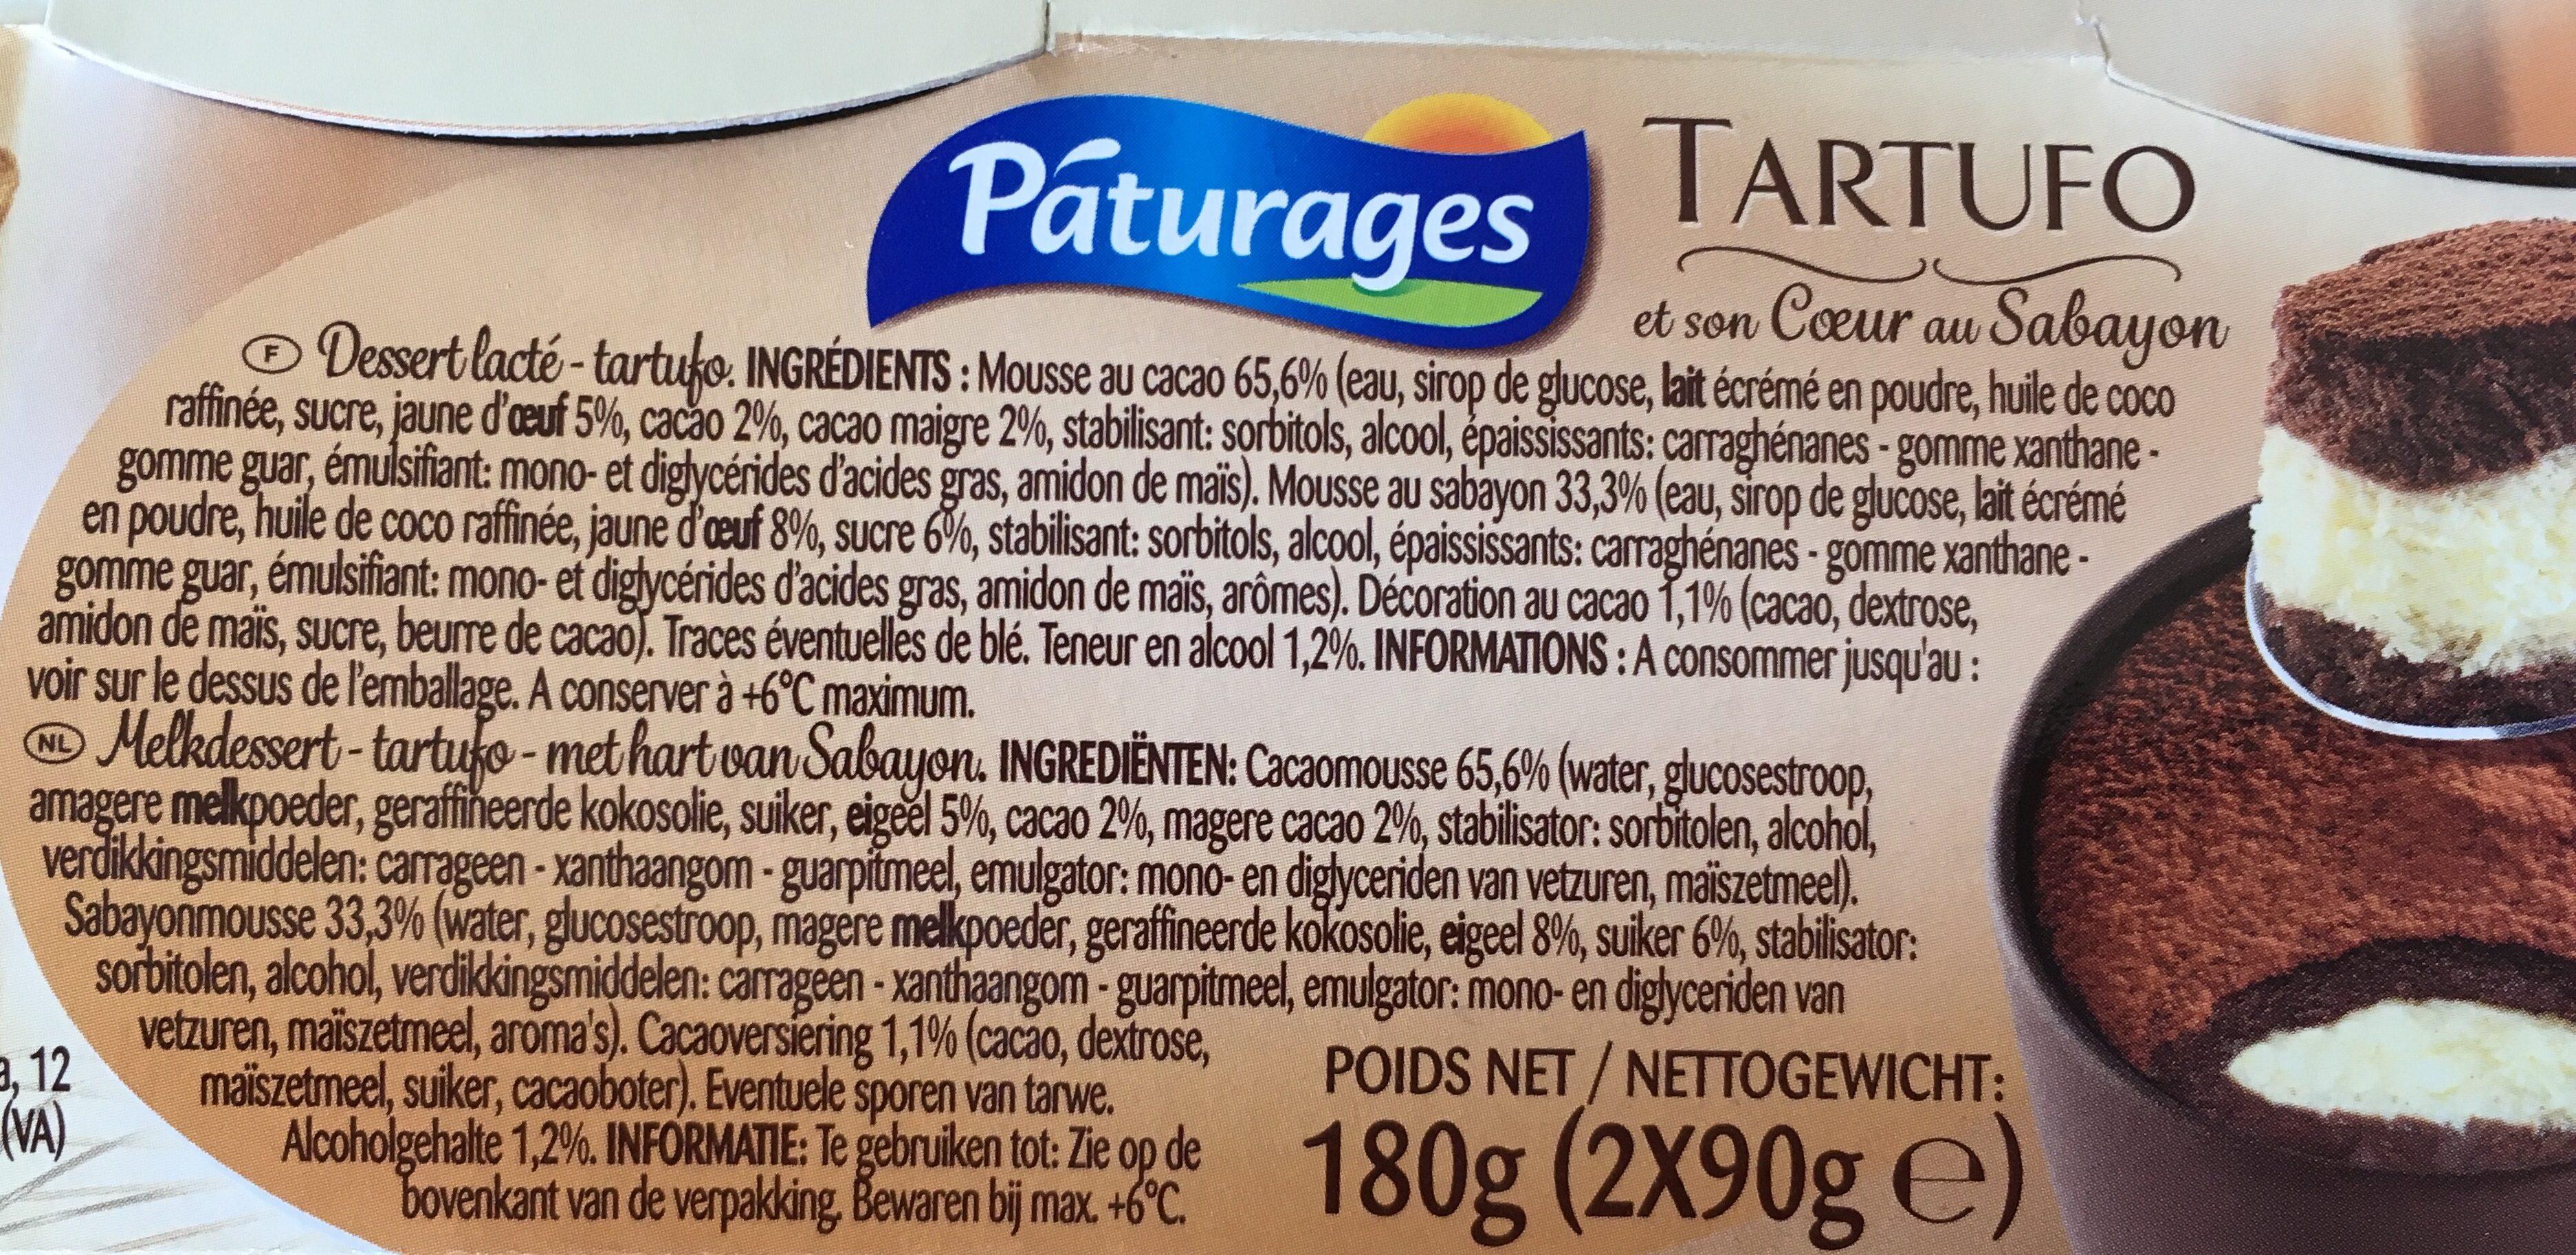 Tartufo - et son Coeur au Sabayon - Ingredients